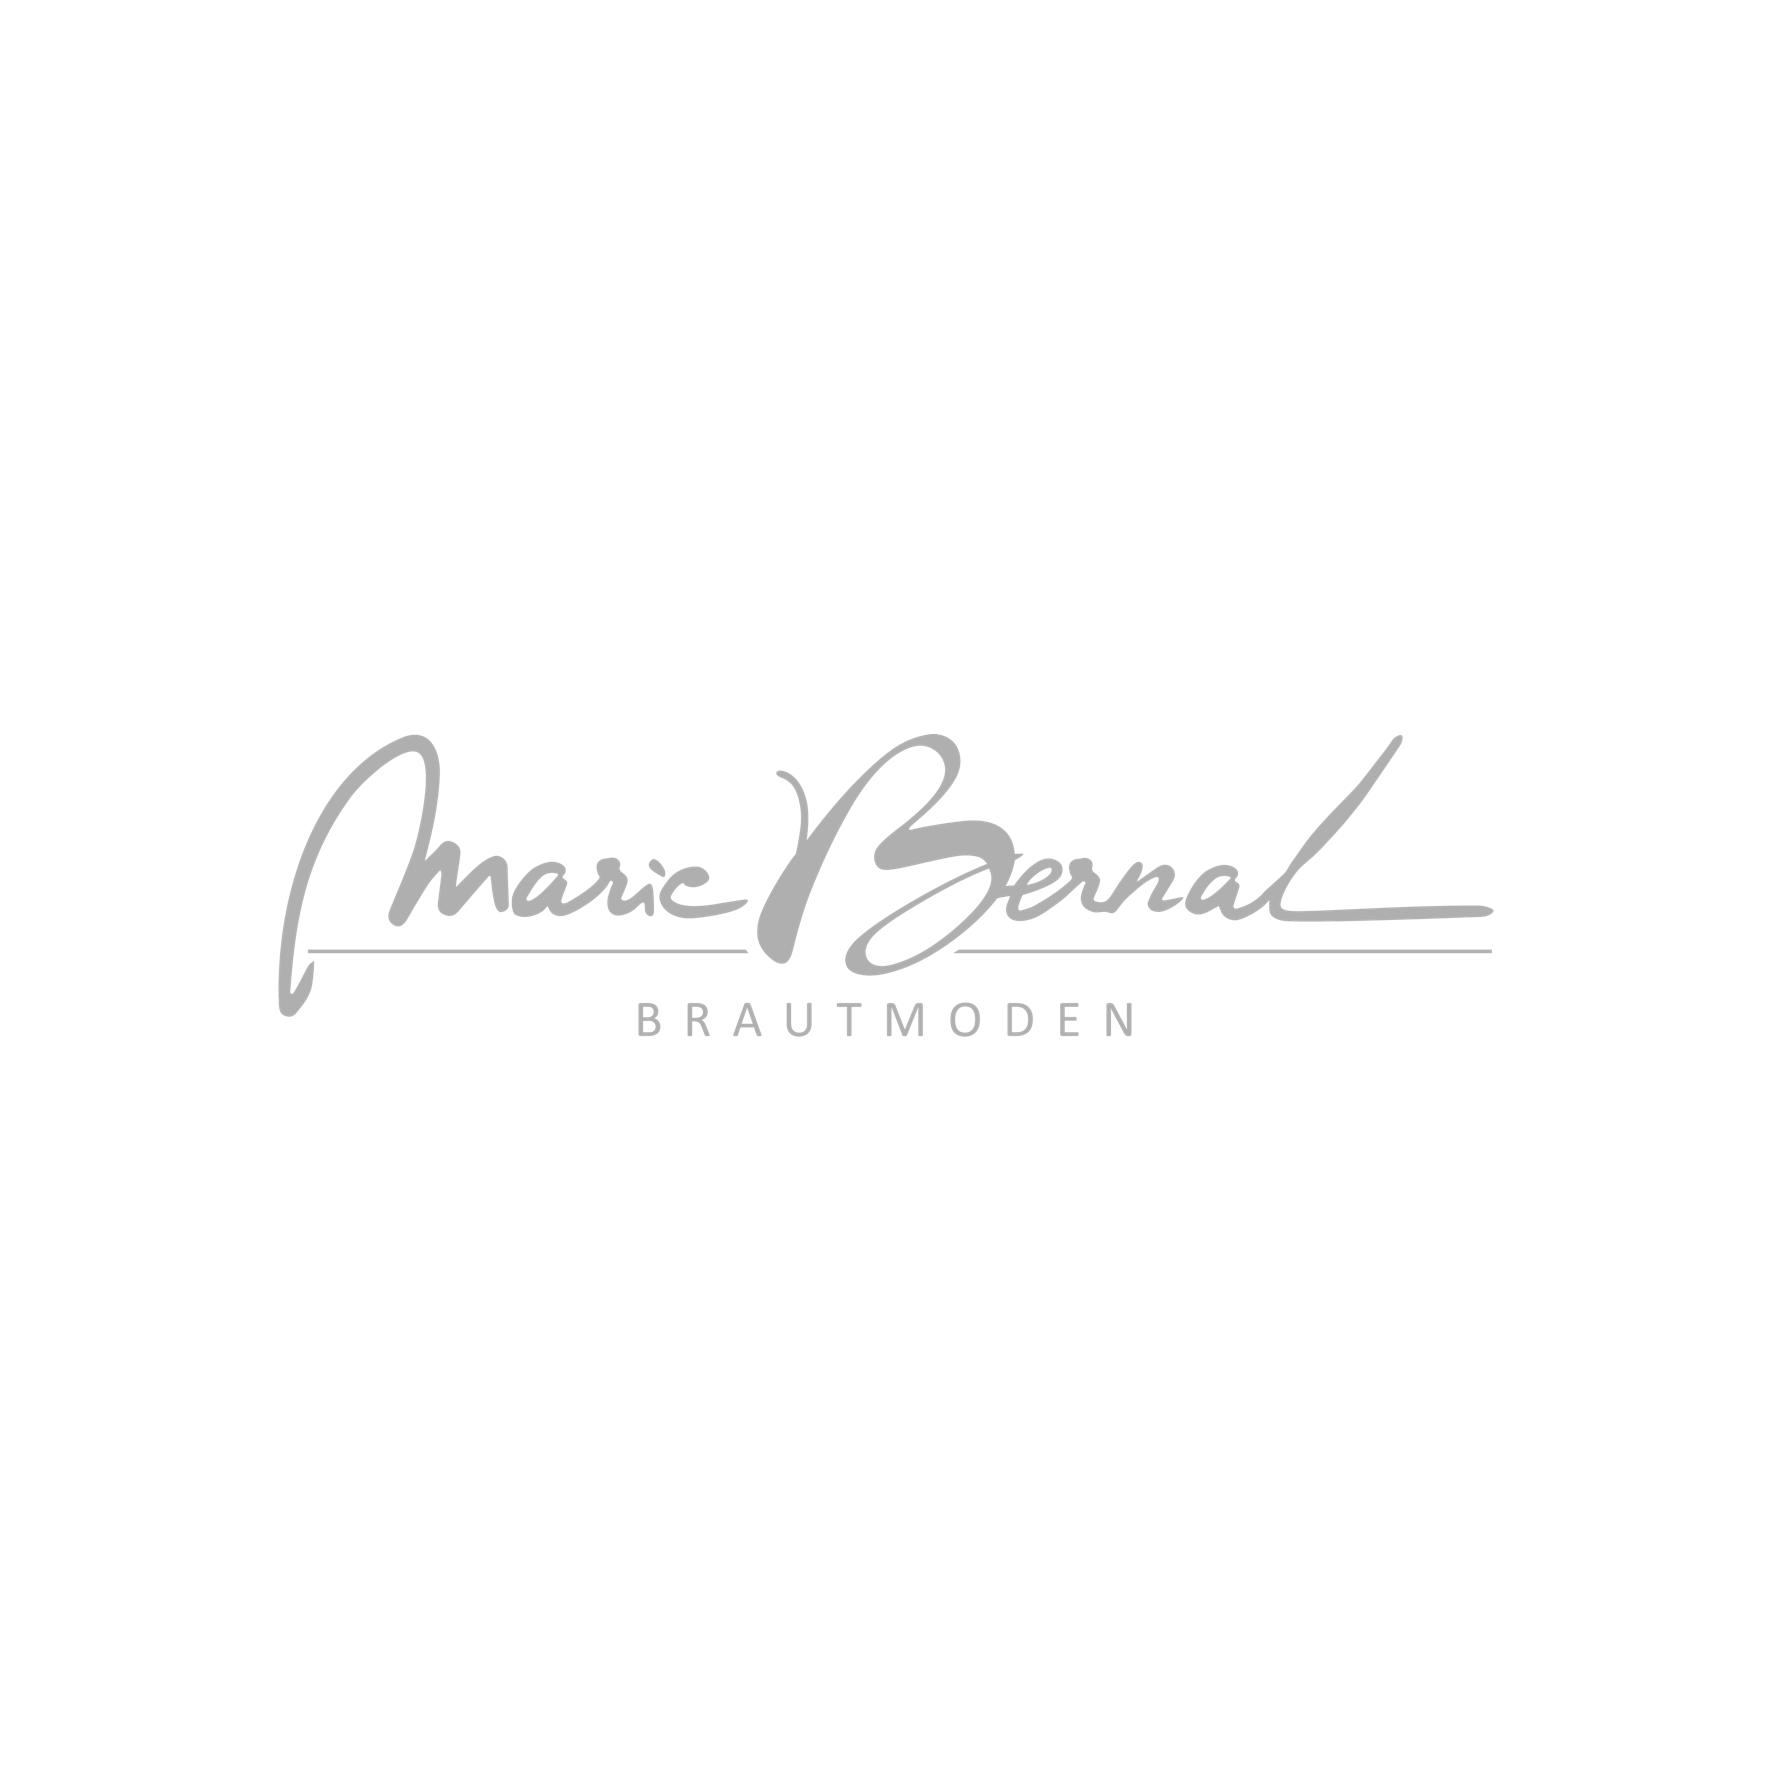 Brautmode | Wetzlar | Brautmoden Marie Bernal